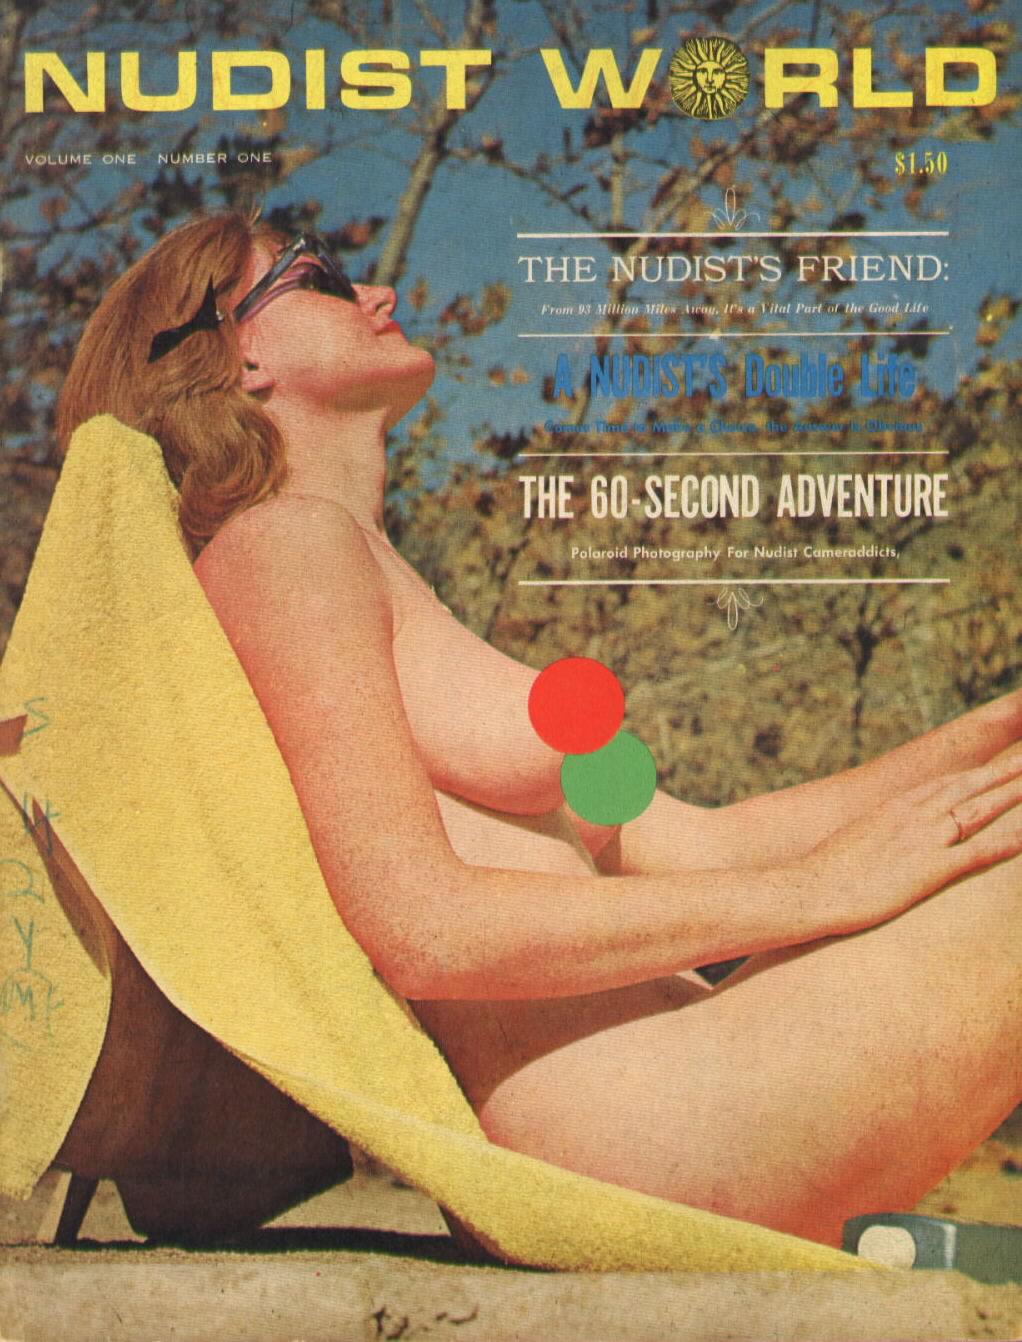 Nudist World Vol. 1 # 1 magazine back issue Nudist World magizine back copy